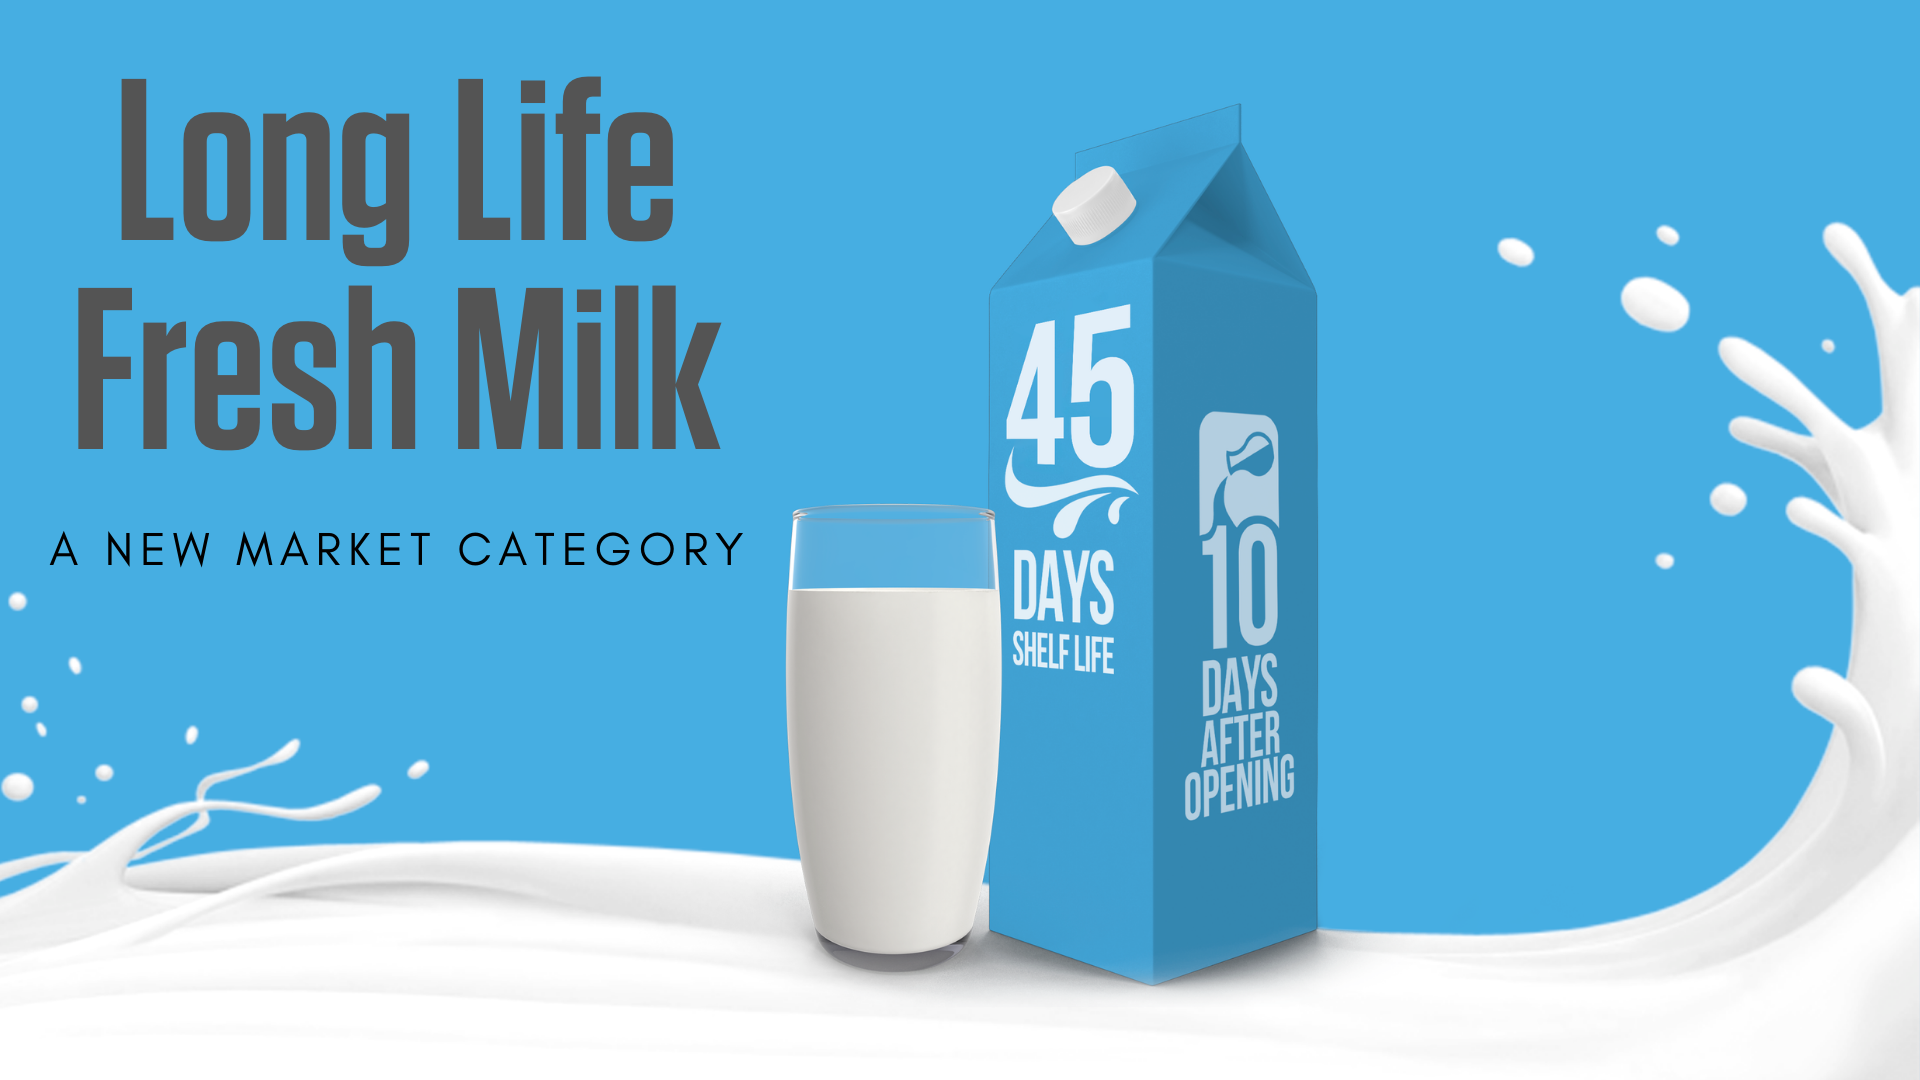 MST Long Life Fresh Milk 45 days